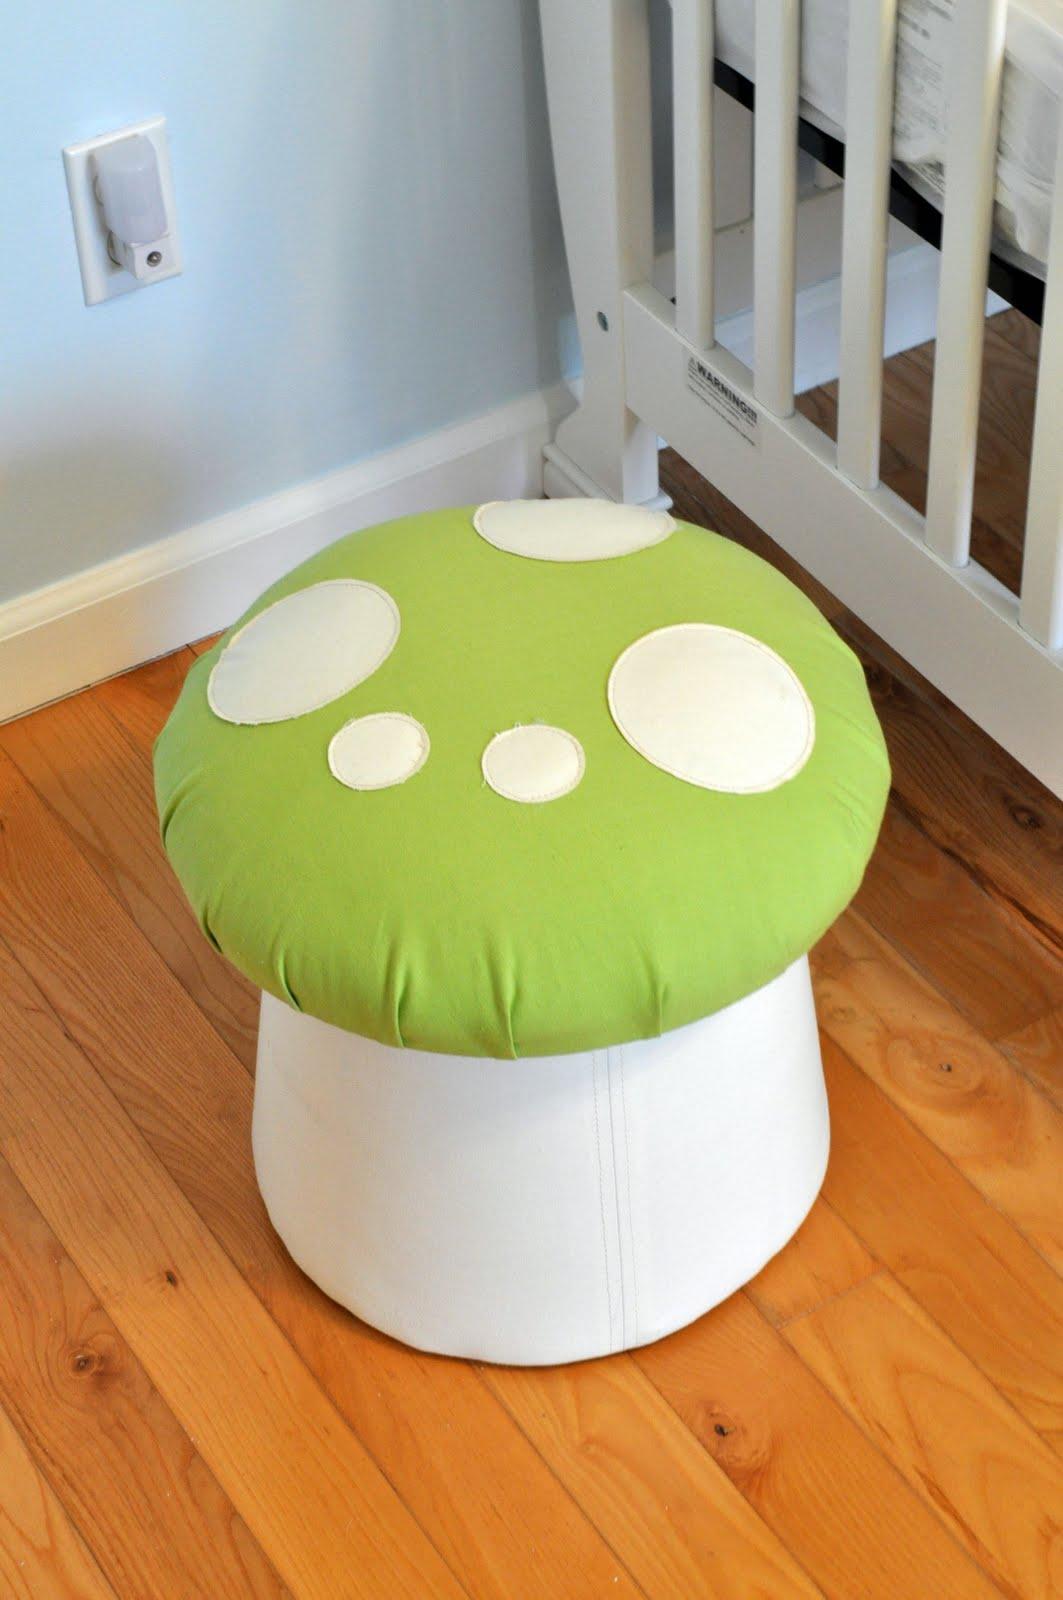 Bucket stool met stool small file fogo brushed stainless steel